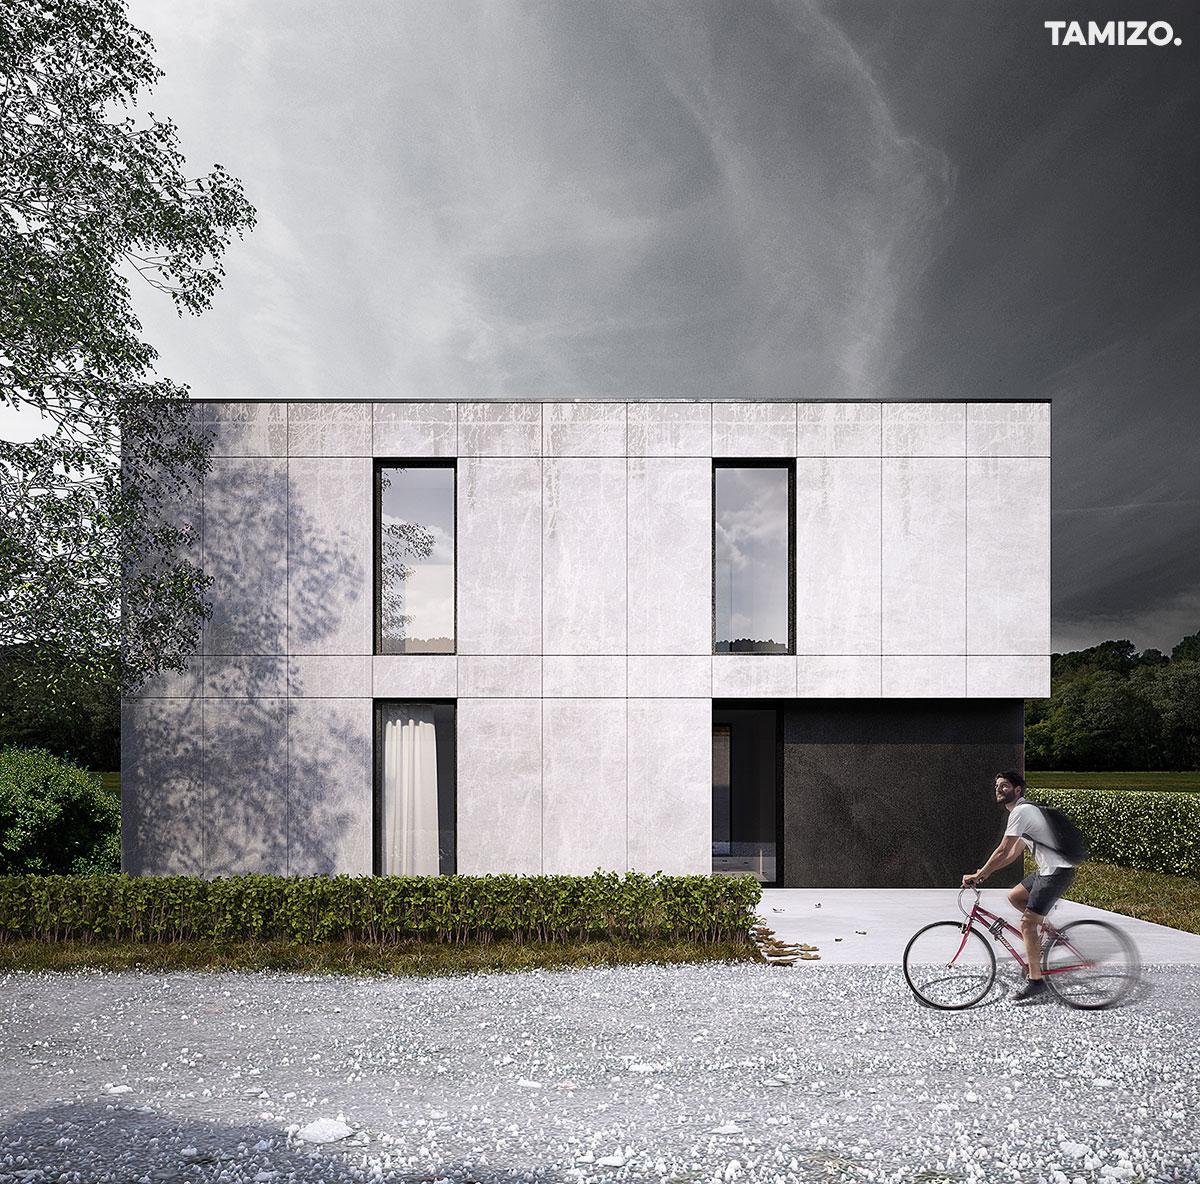 A063_tamizo_architects_mateusz_kuo_stolarski_dom_projekt_wojtka_pabianice_maly_domek_02